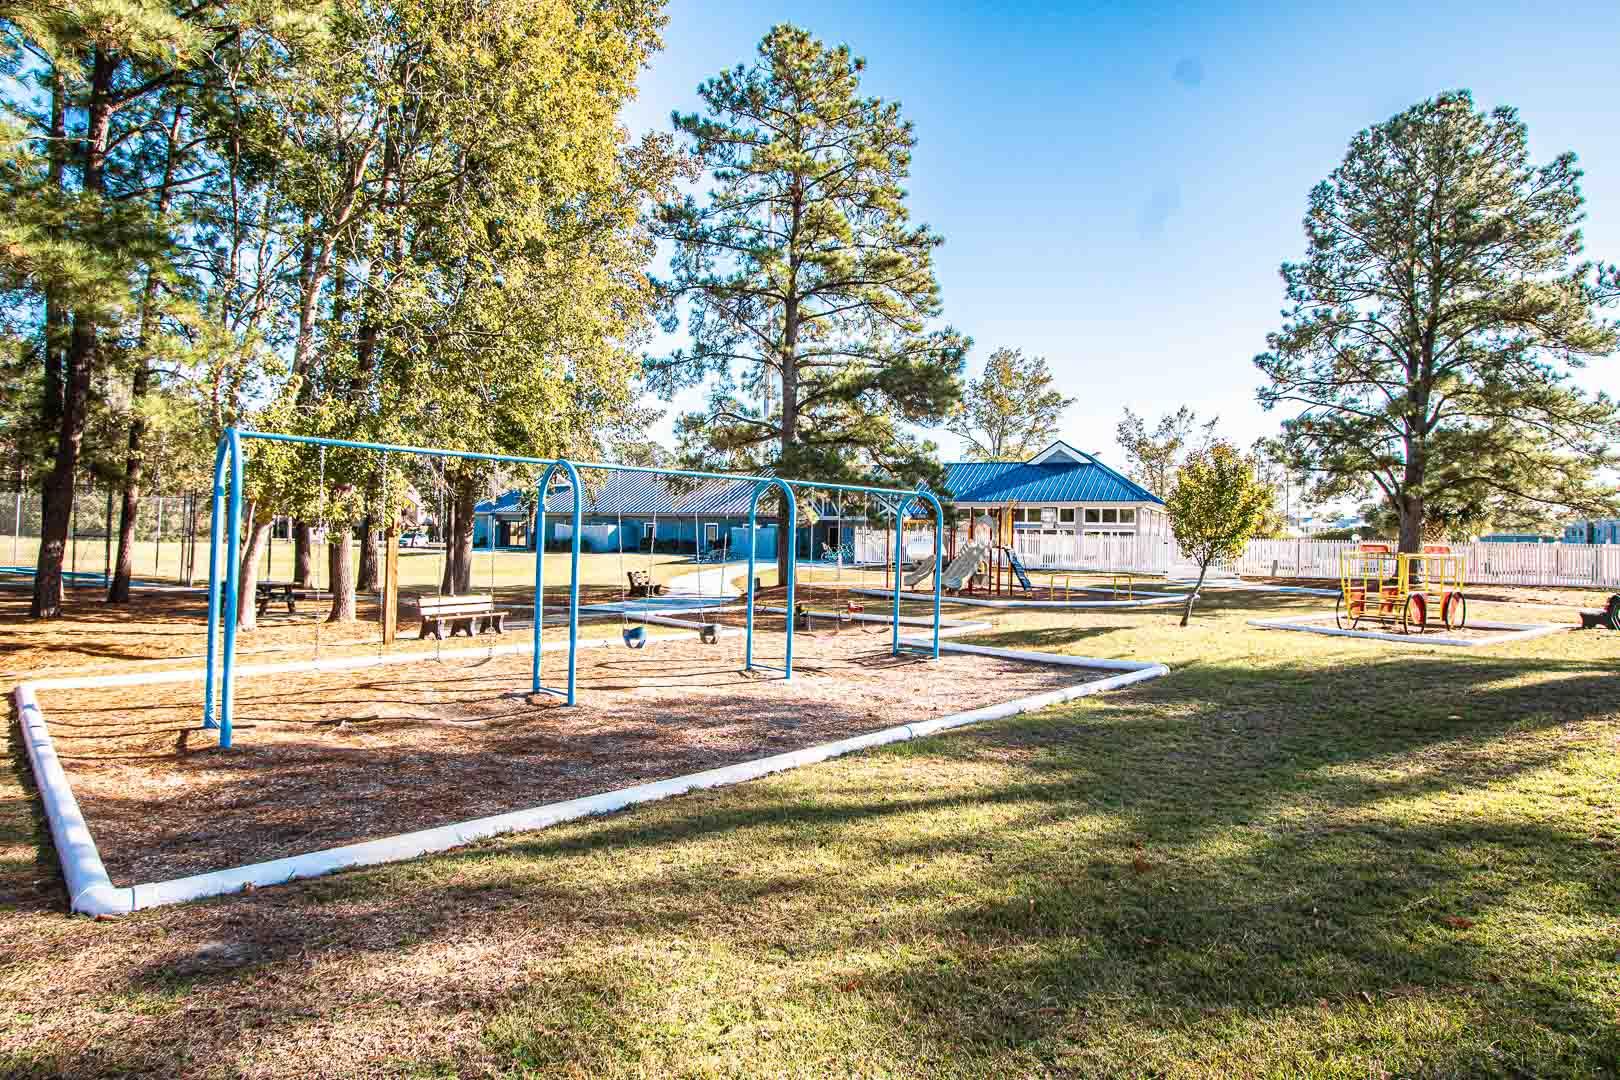 An outdoor children's playground at VRI's Sandcastle Village in New Bern, North Carolina.